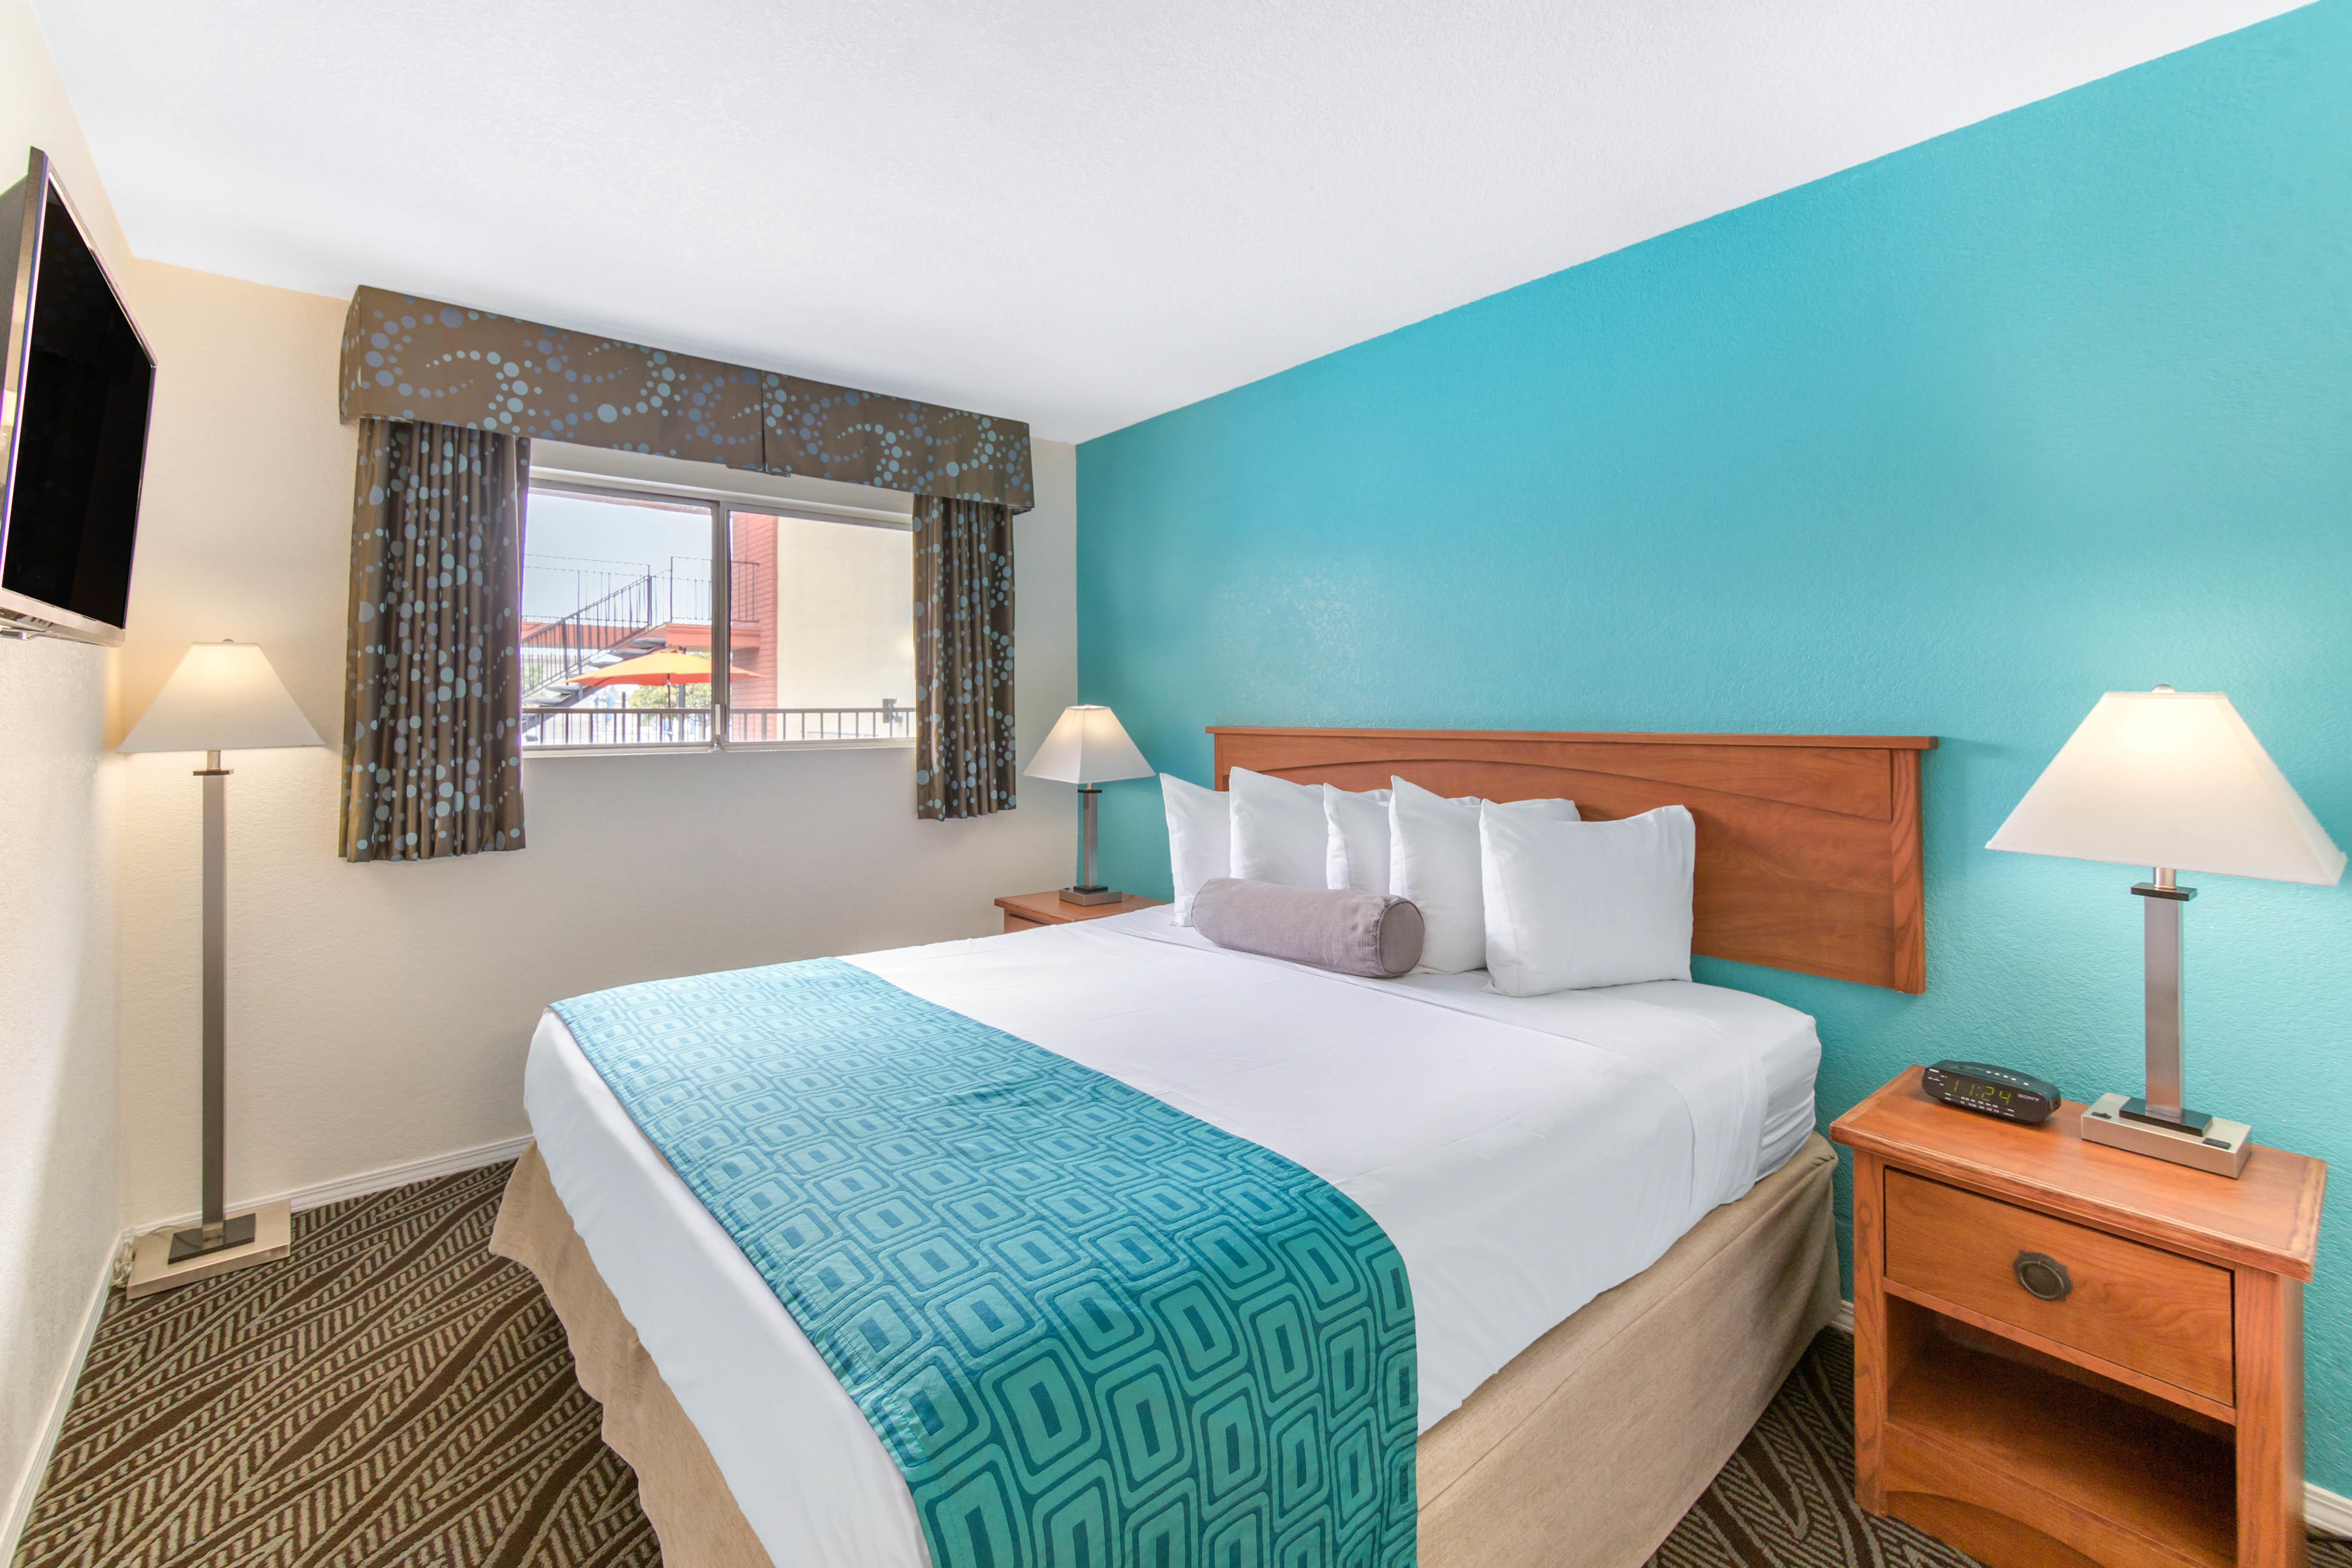 Howard Johnson by Wyndham Chula Vista San Diego Suite Hotel image 8